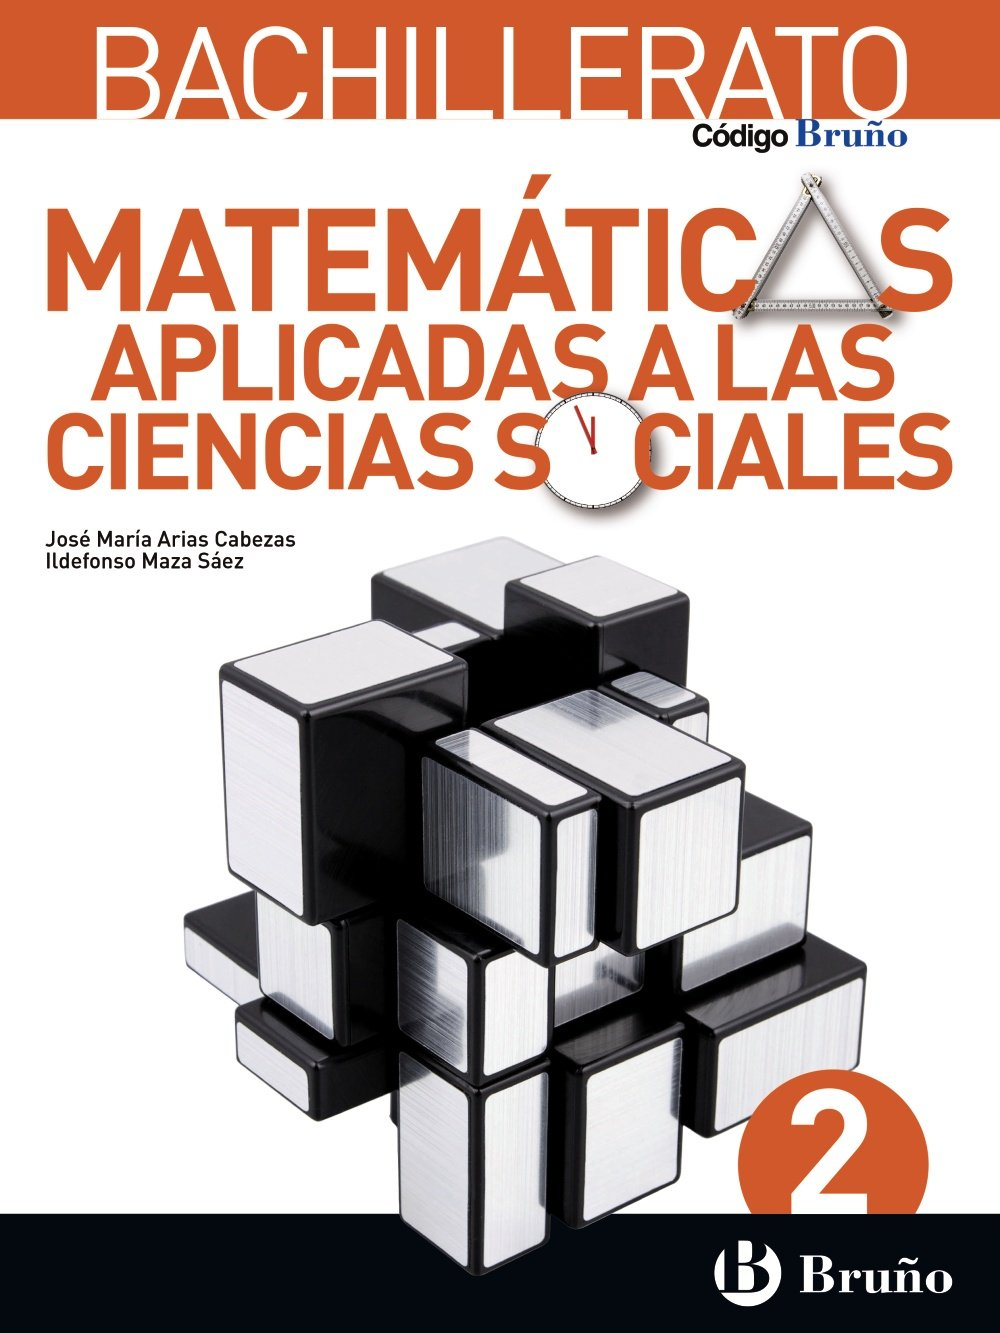 Código Bruño Matemáticas Aplicadas a las Ciencias Sociales 2 Bachillerato - 9788469611579: Amazon.es: Arias Cabezas, José María, Maza Saez, Ildefonso: Libros